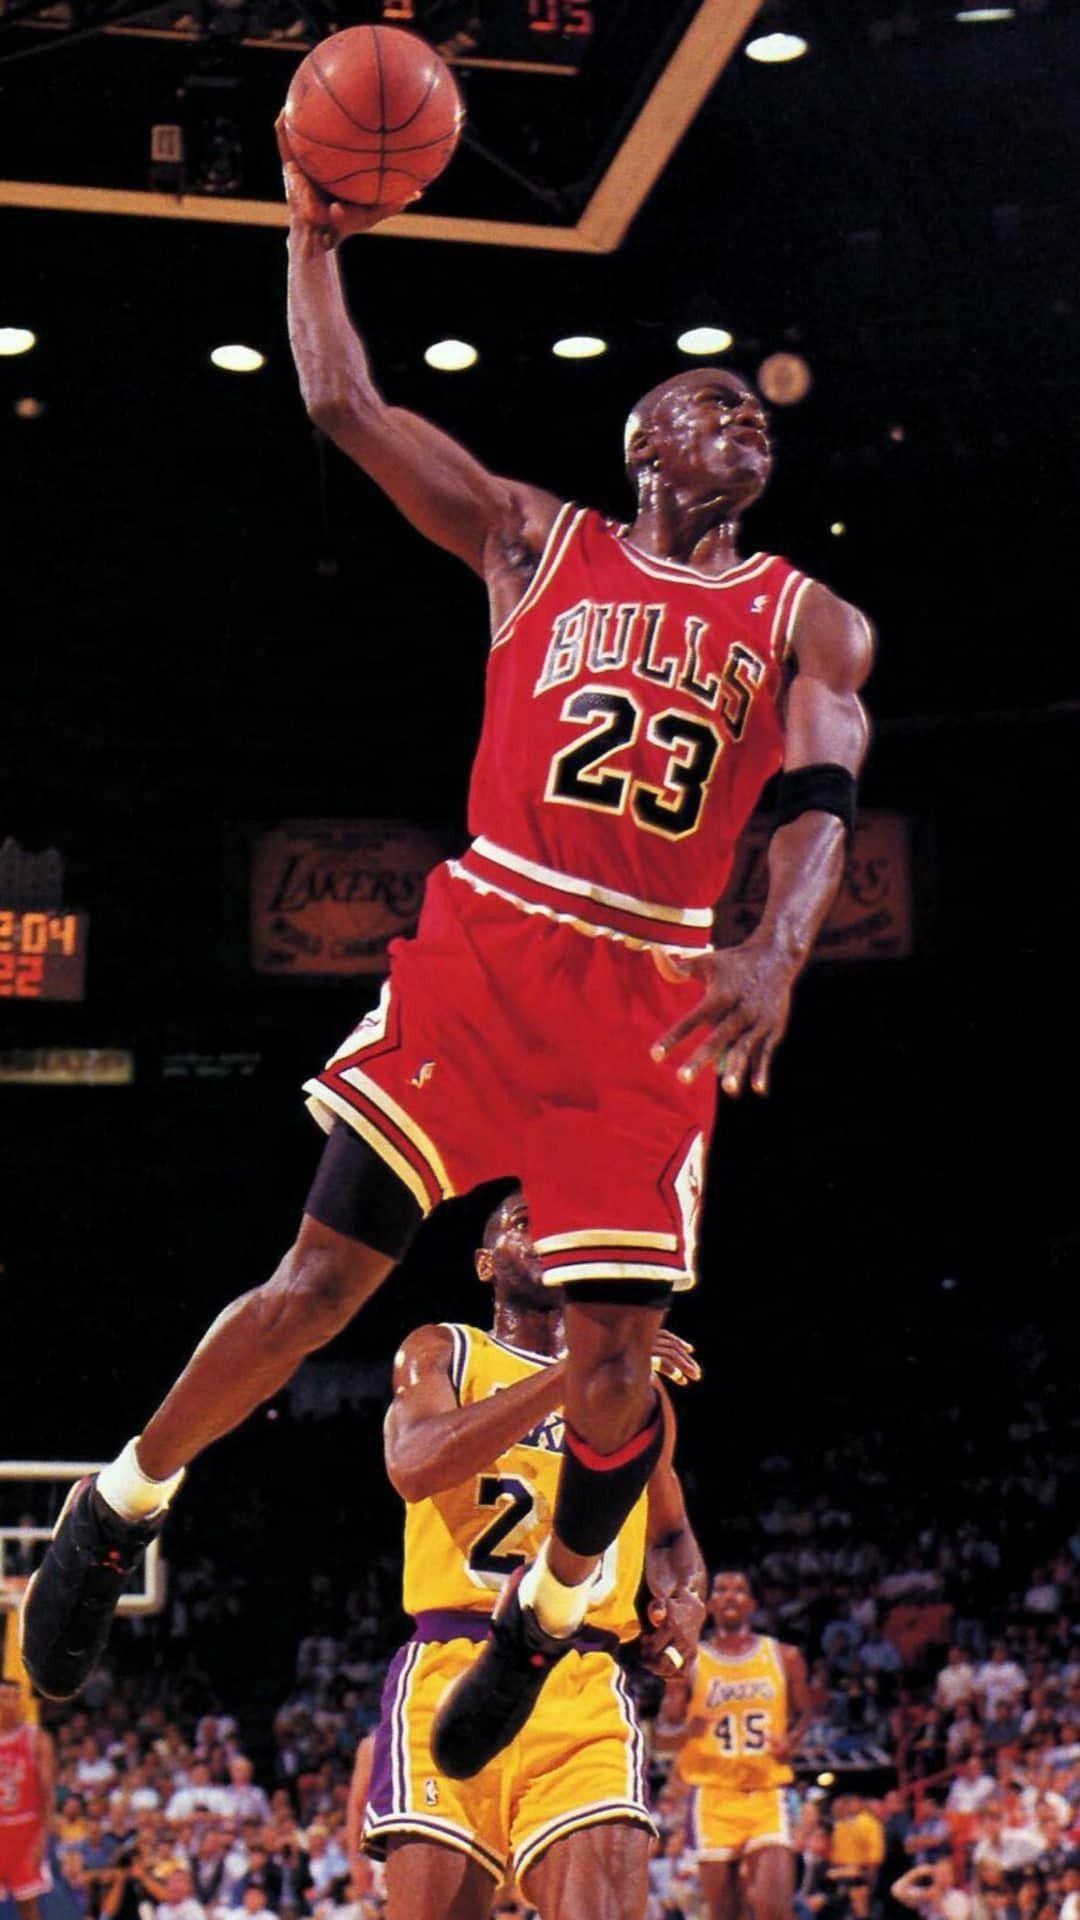 BasketballQuestions BasketballShoesSale Michael jordan